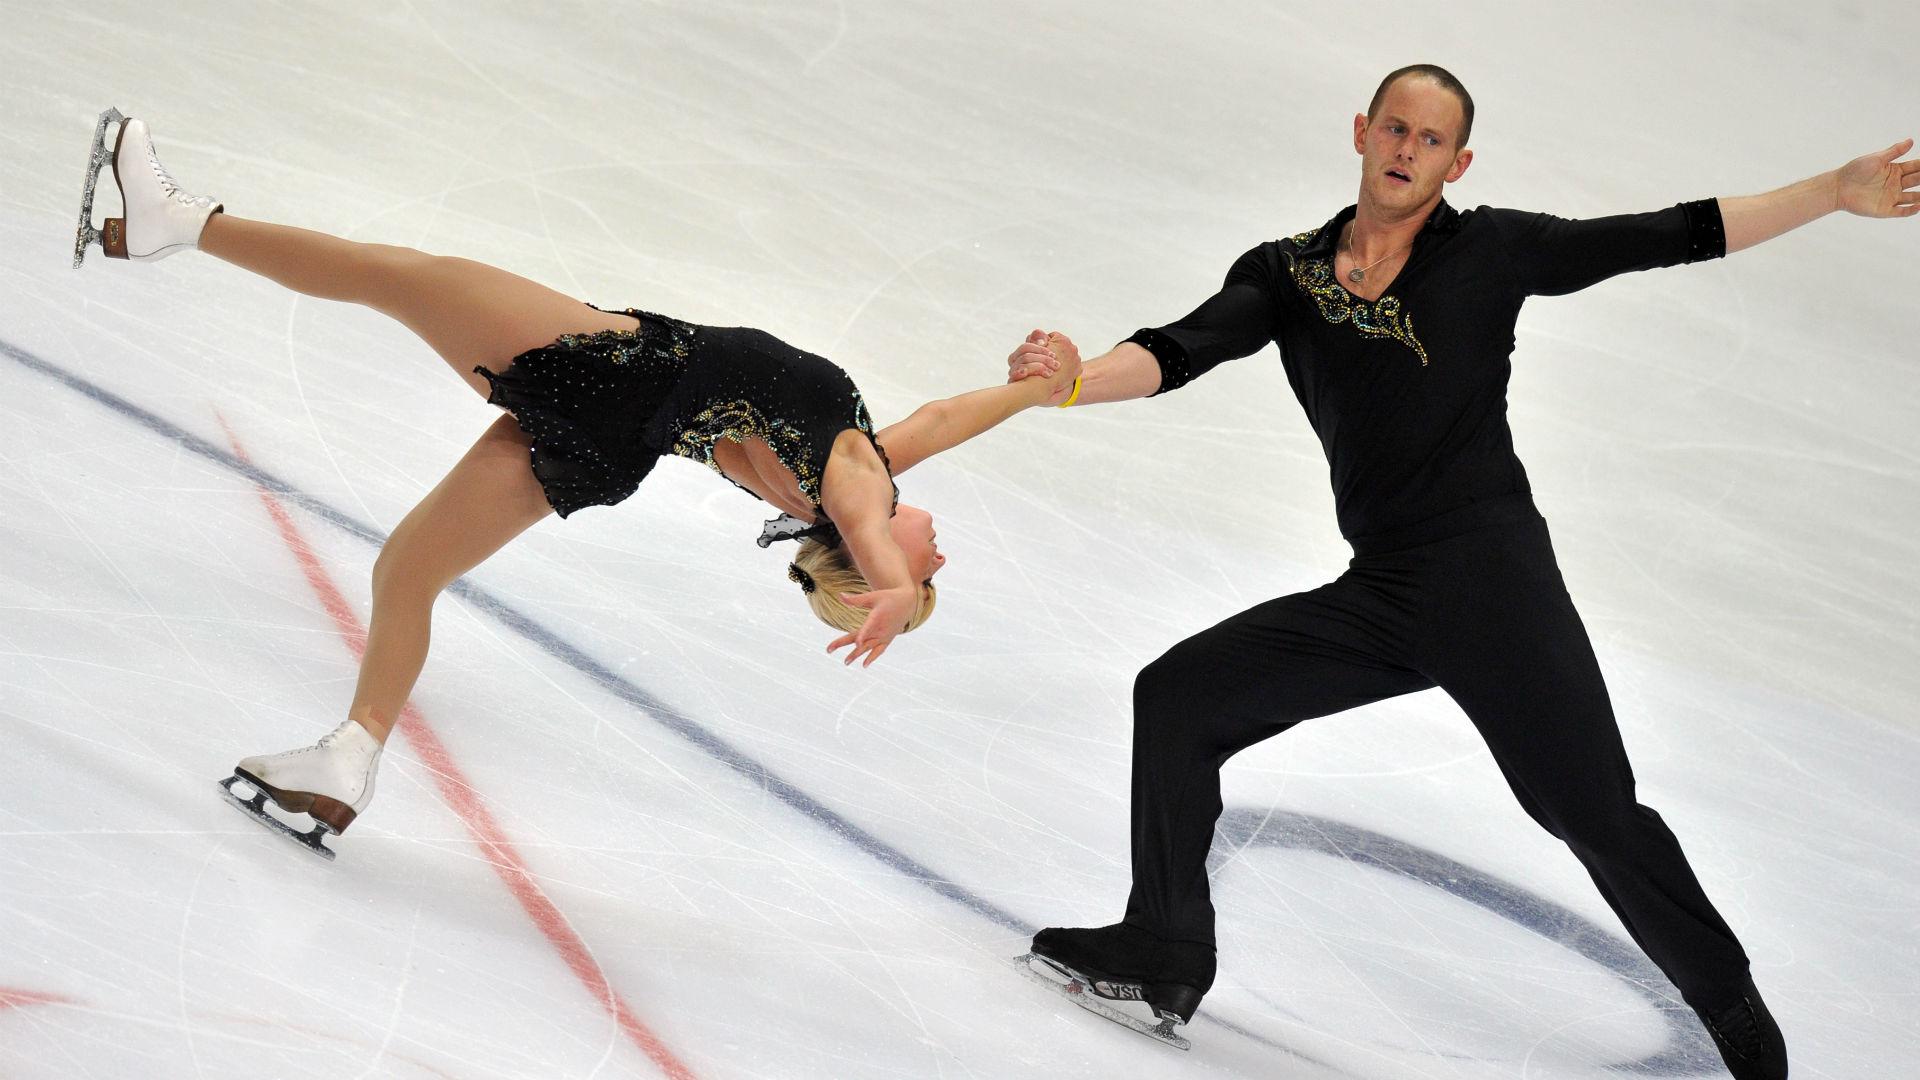 Former US Figure Skating Champ John Coughlin Hanged